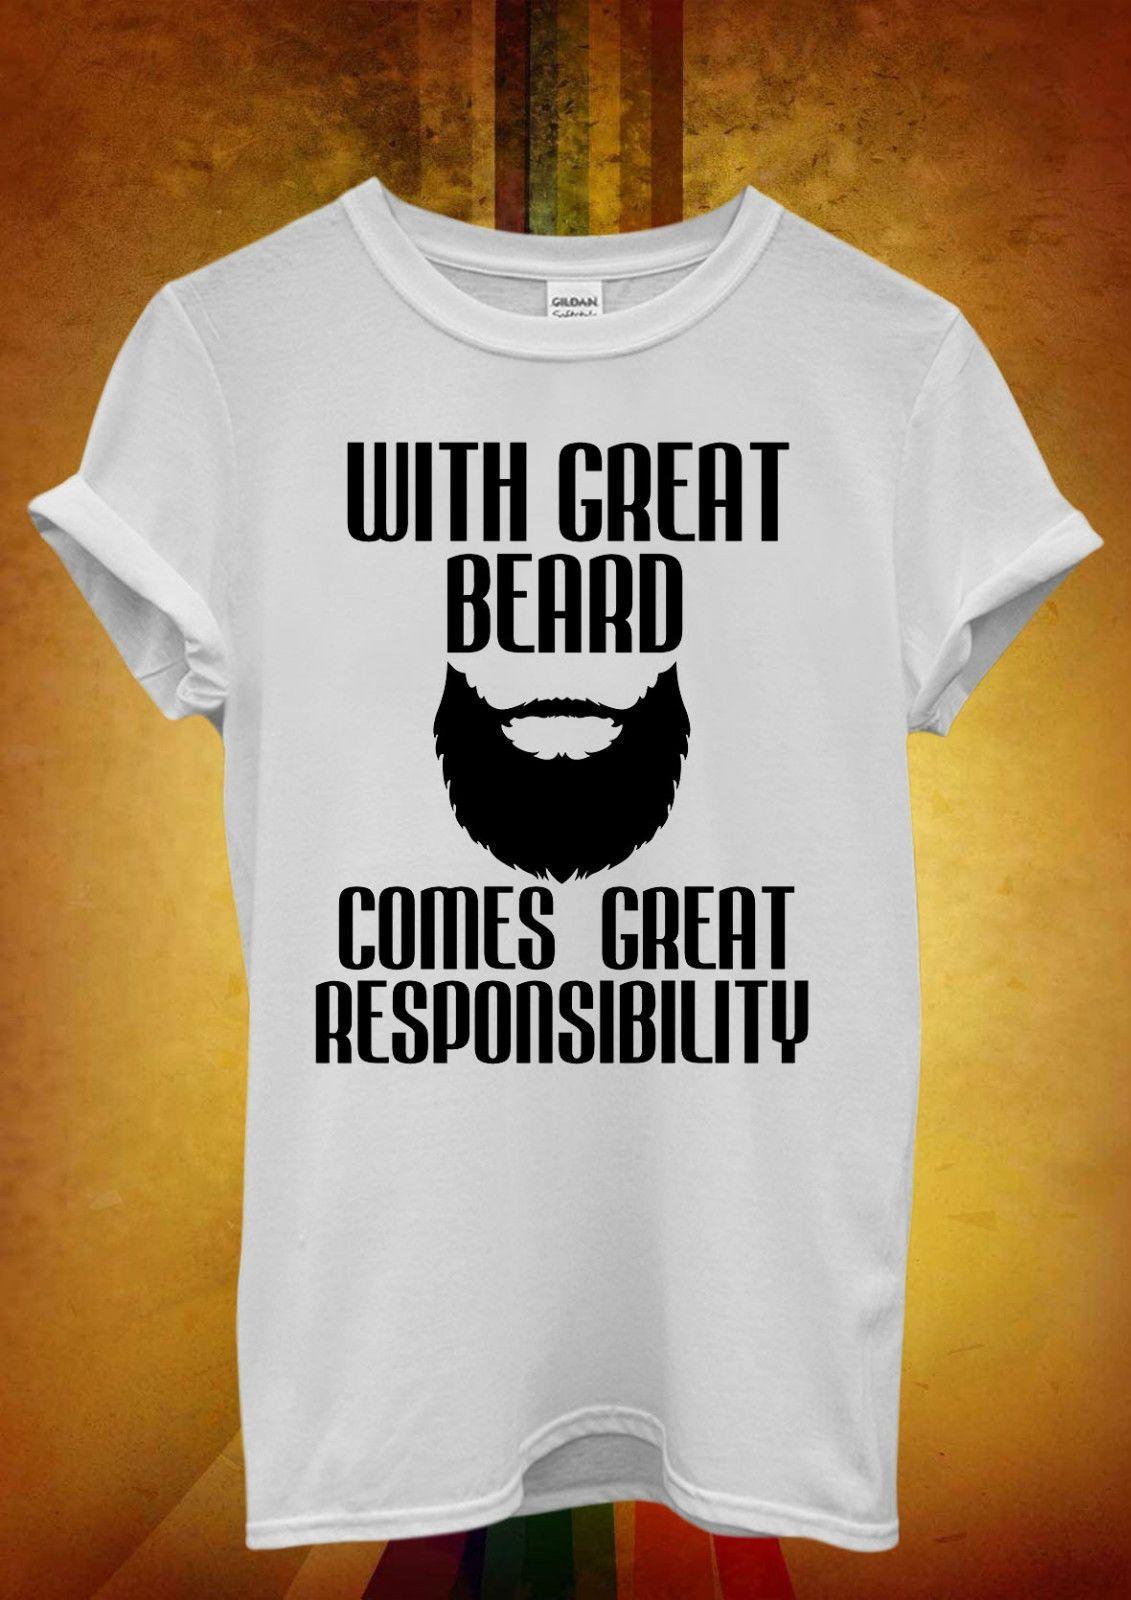 f204aeead6596d Great Beard Responsibility Ladies Men Women Unisex T Shirt Tank Top Vest  1068 Style Round Style Tshirt Tees Custom Jersey T Shirt The Following T  Shirts ...